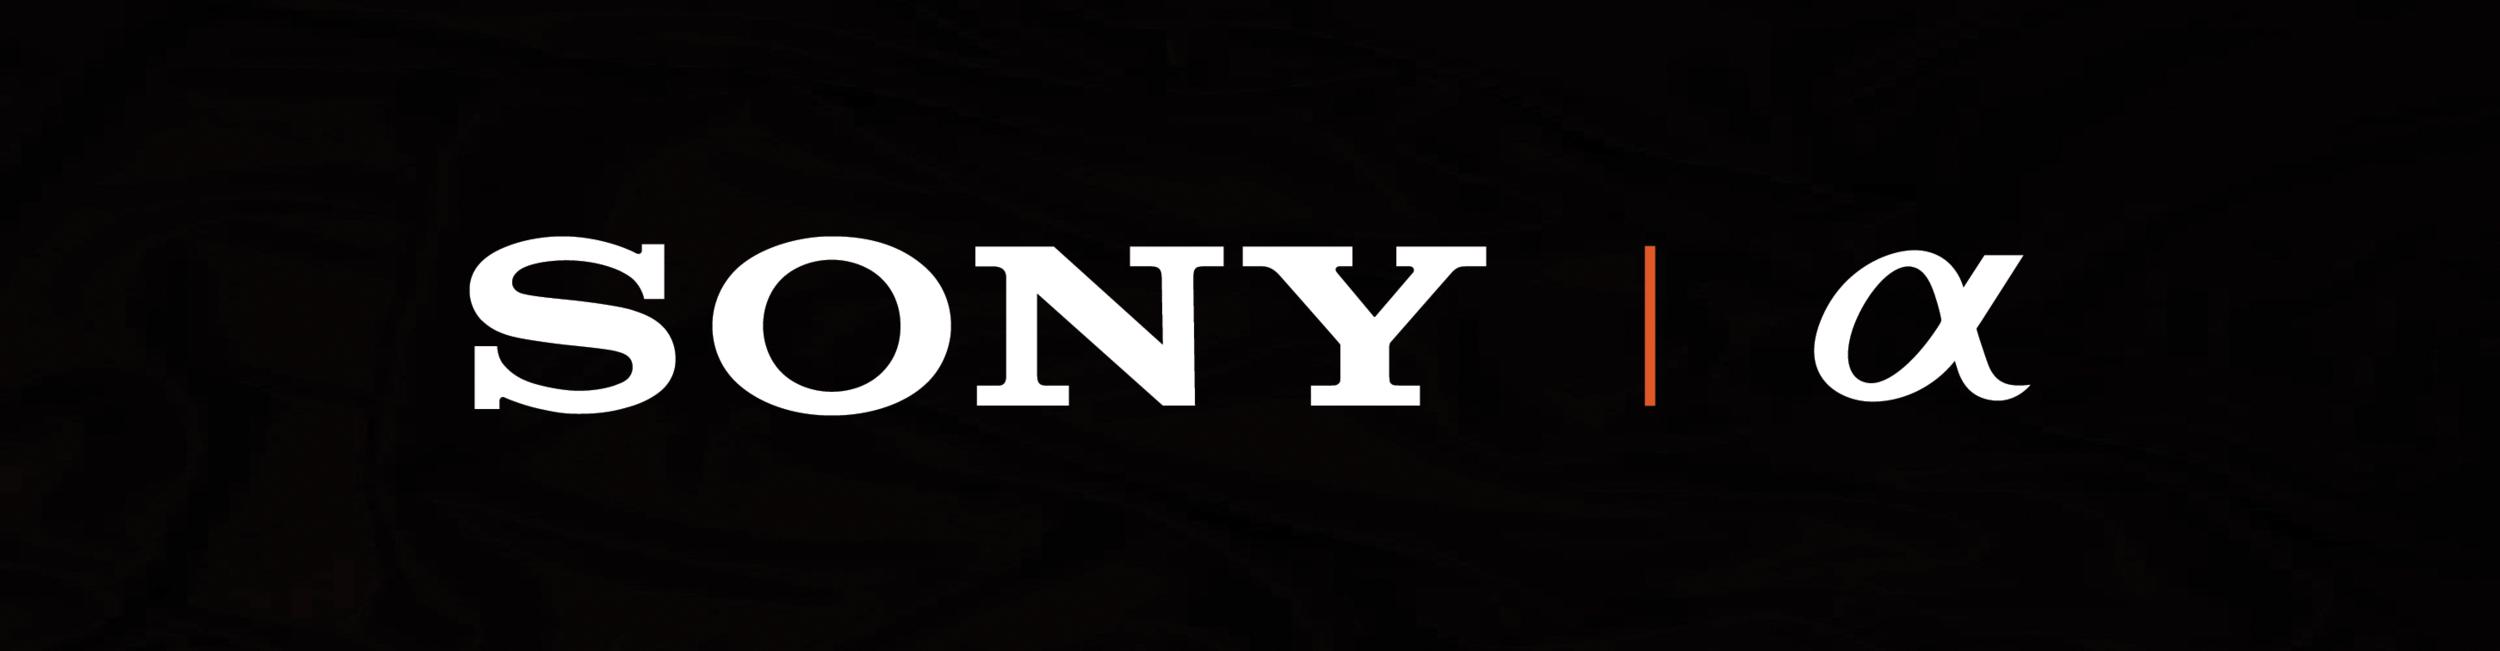 Sony-alpha_LOCK-UP_RGB_DARK.png